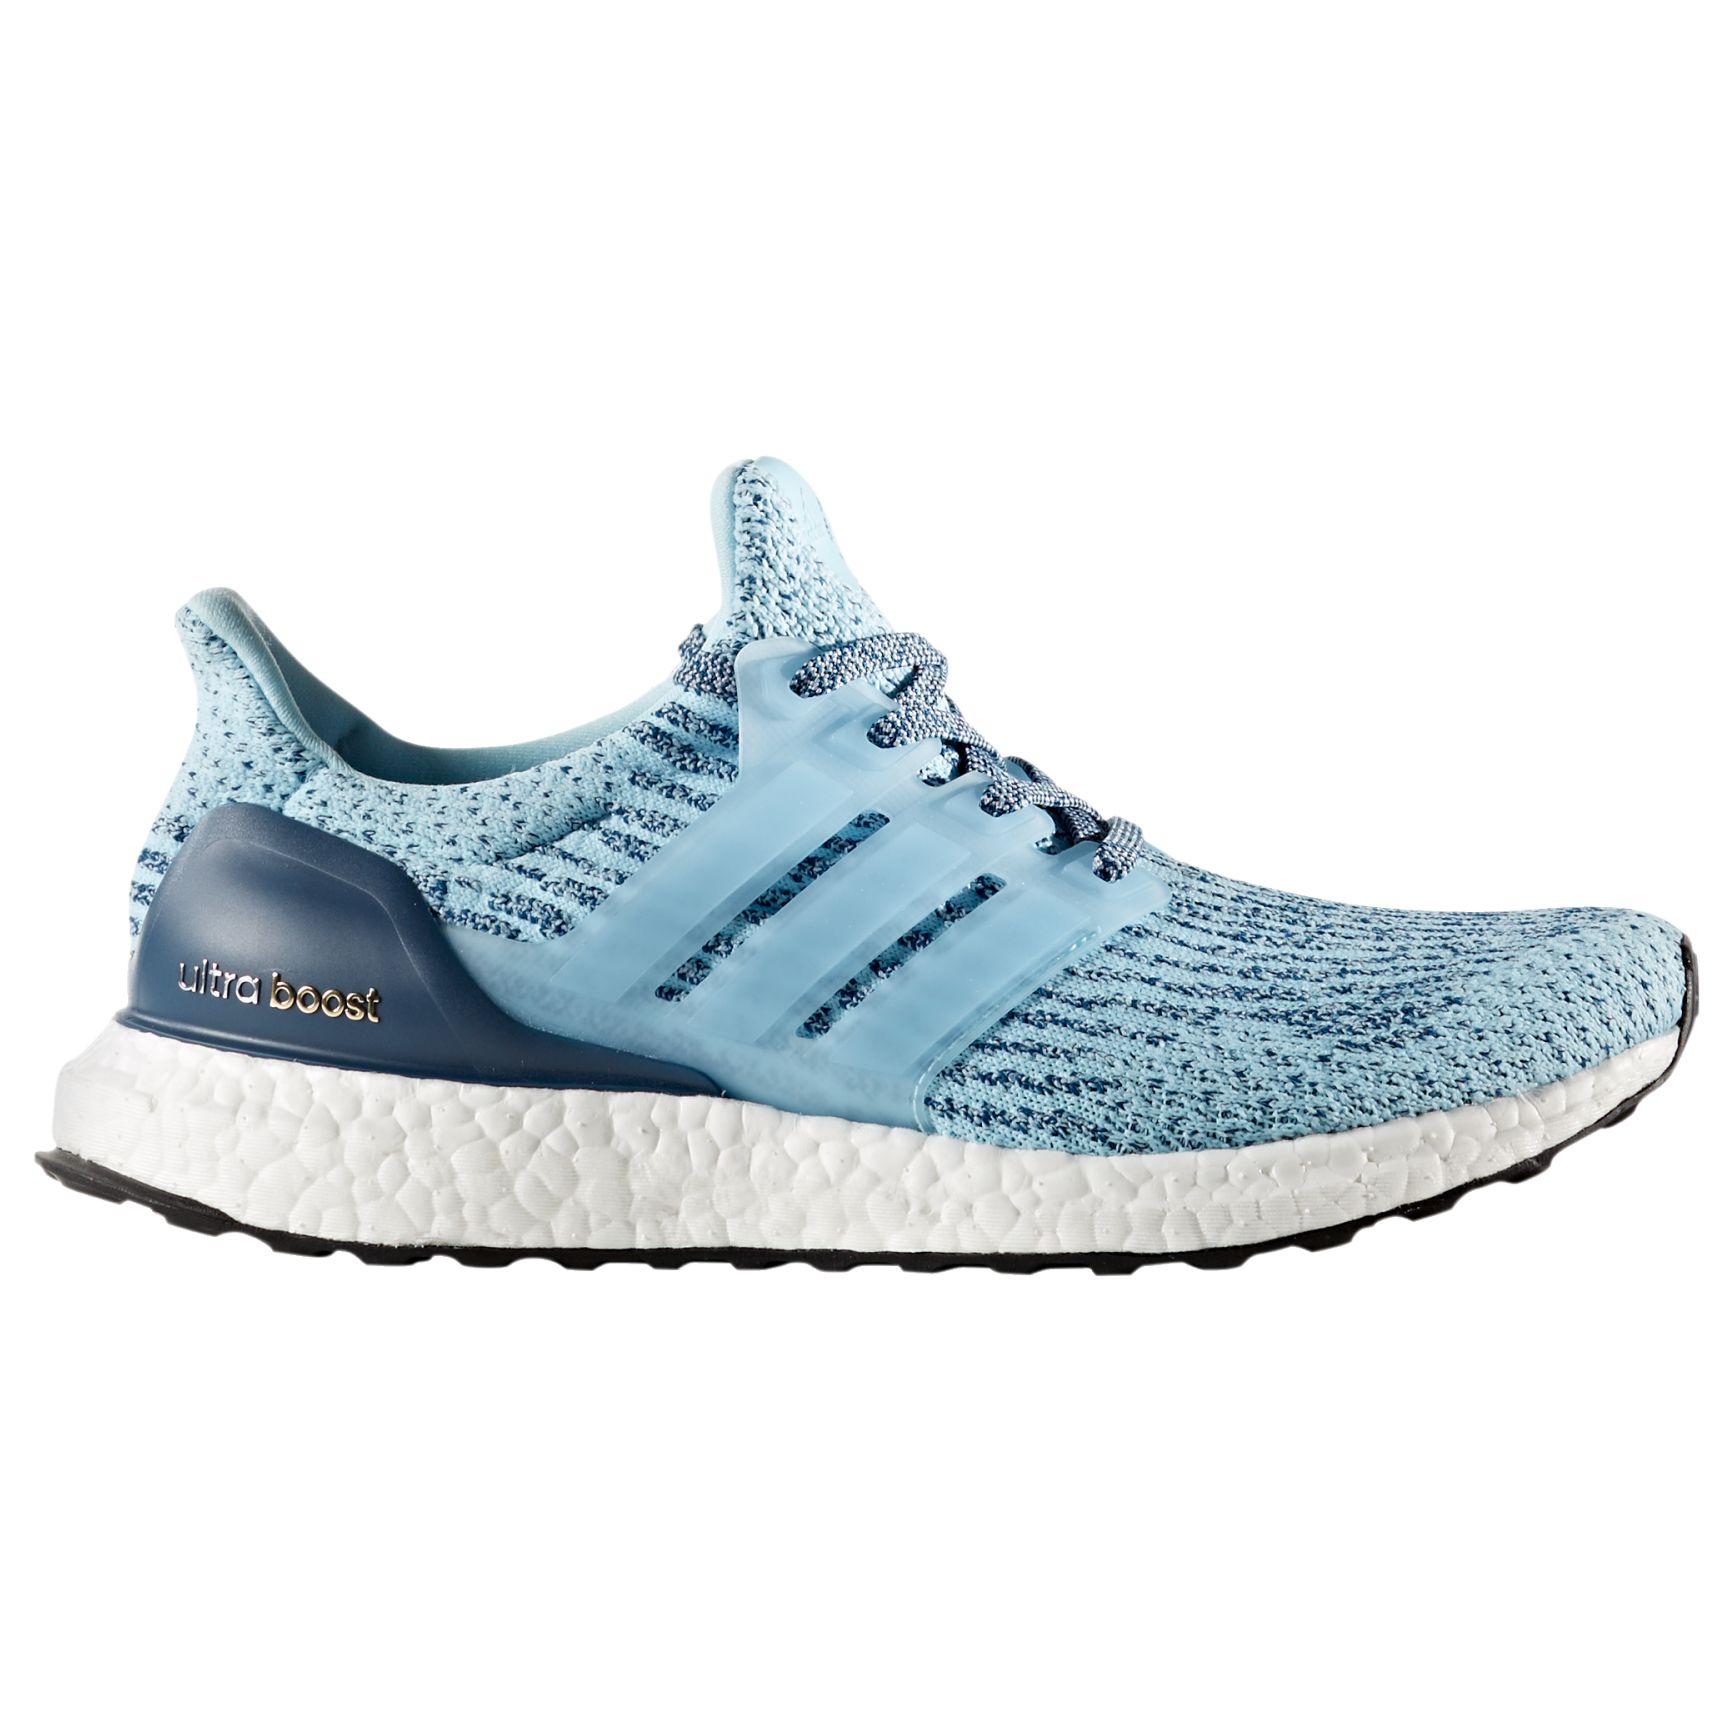 Adidas Blue Ultra Boots Women Sneakers